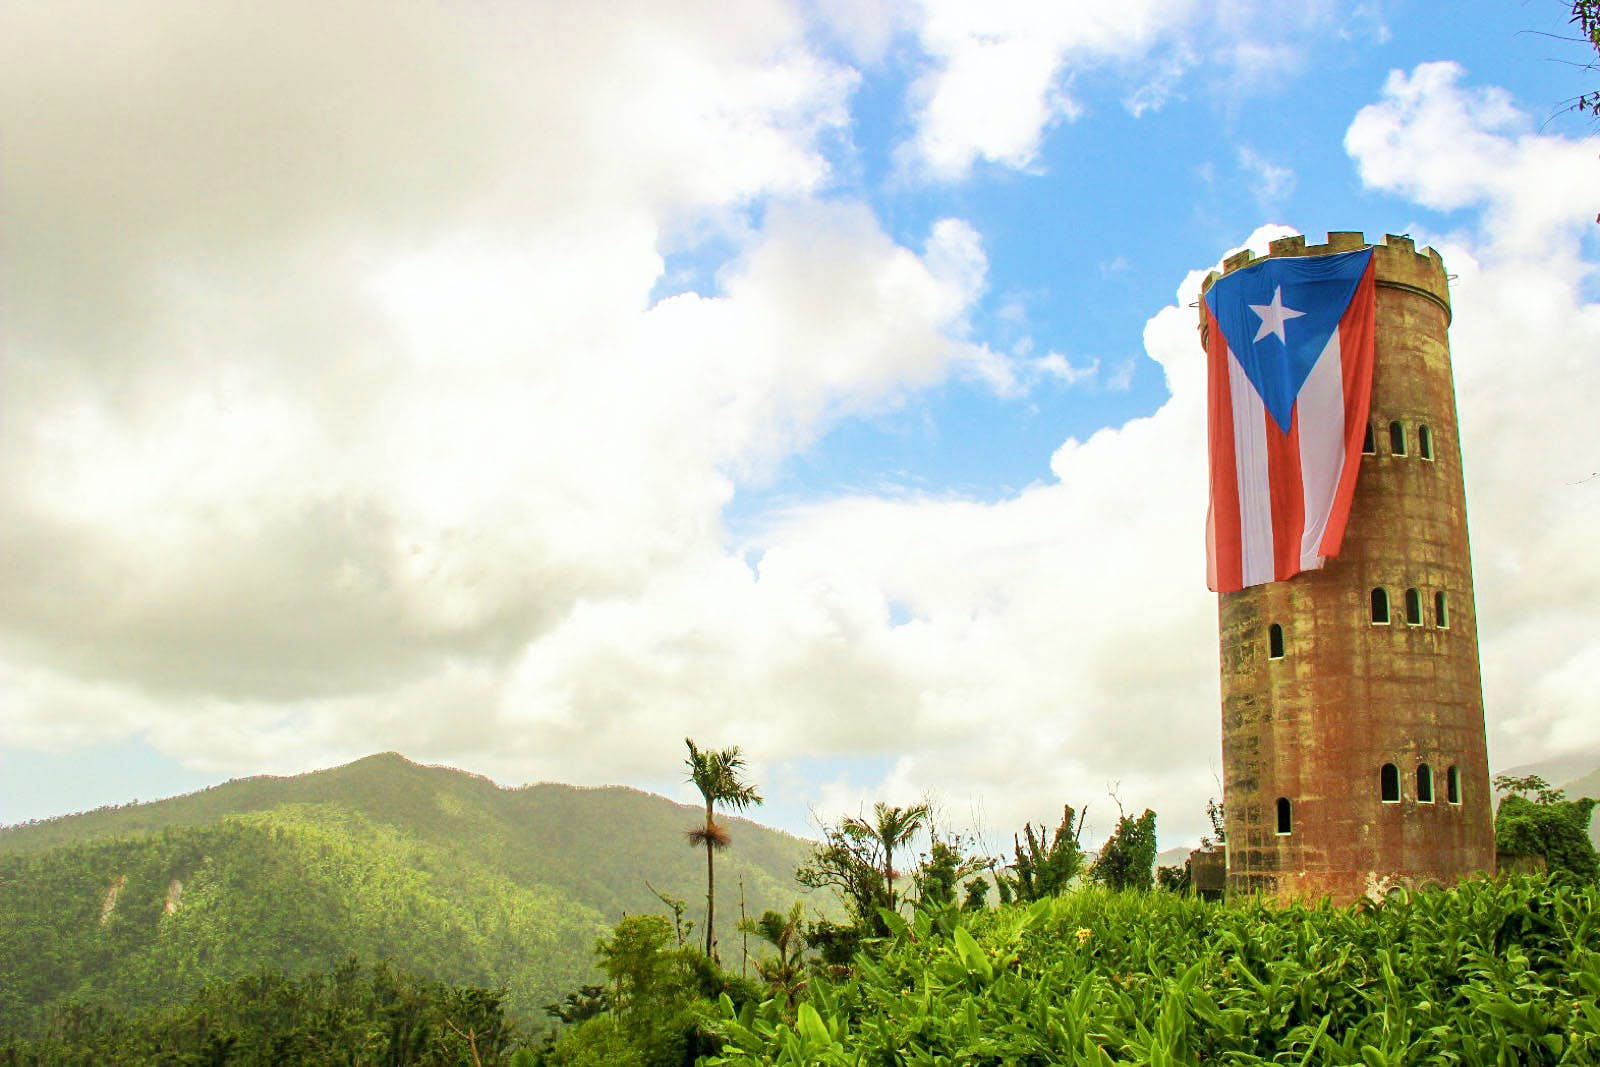 Top 5 Reasons To Visit San Juan Puerto Rico Right Now